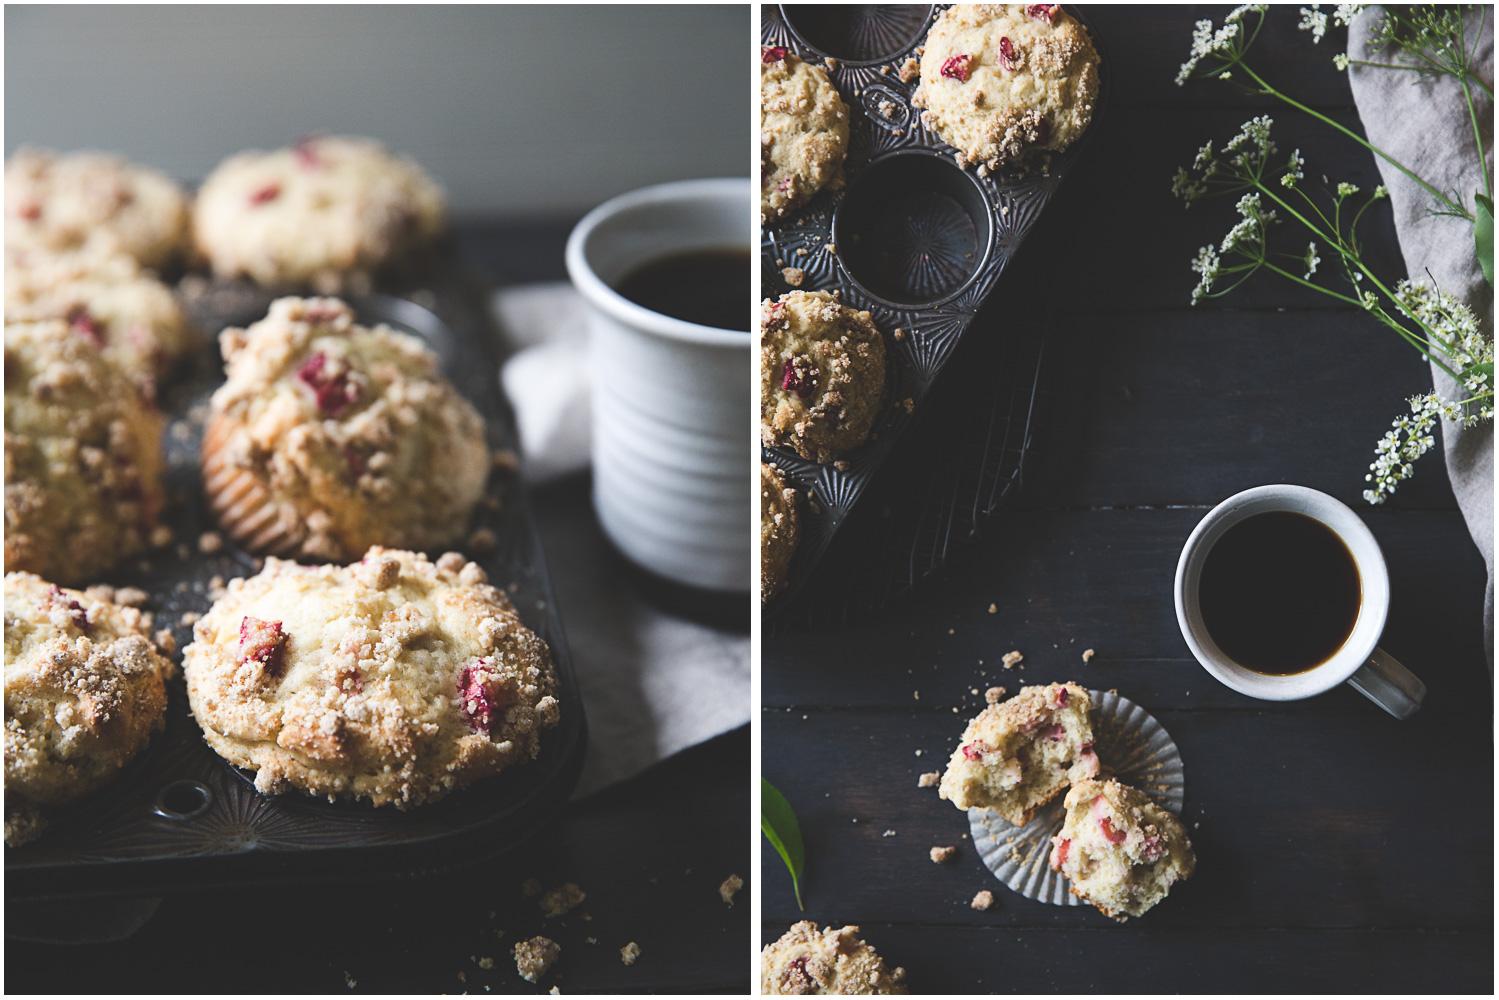 Bragg_Kate_Rhubarb_Muffins_Diptych2.jpg